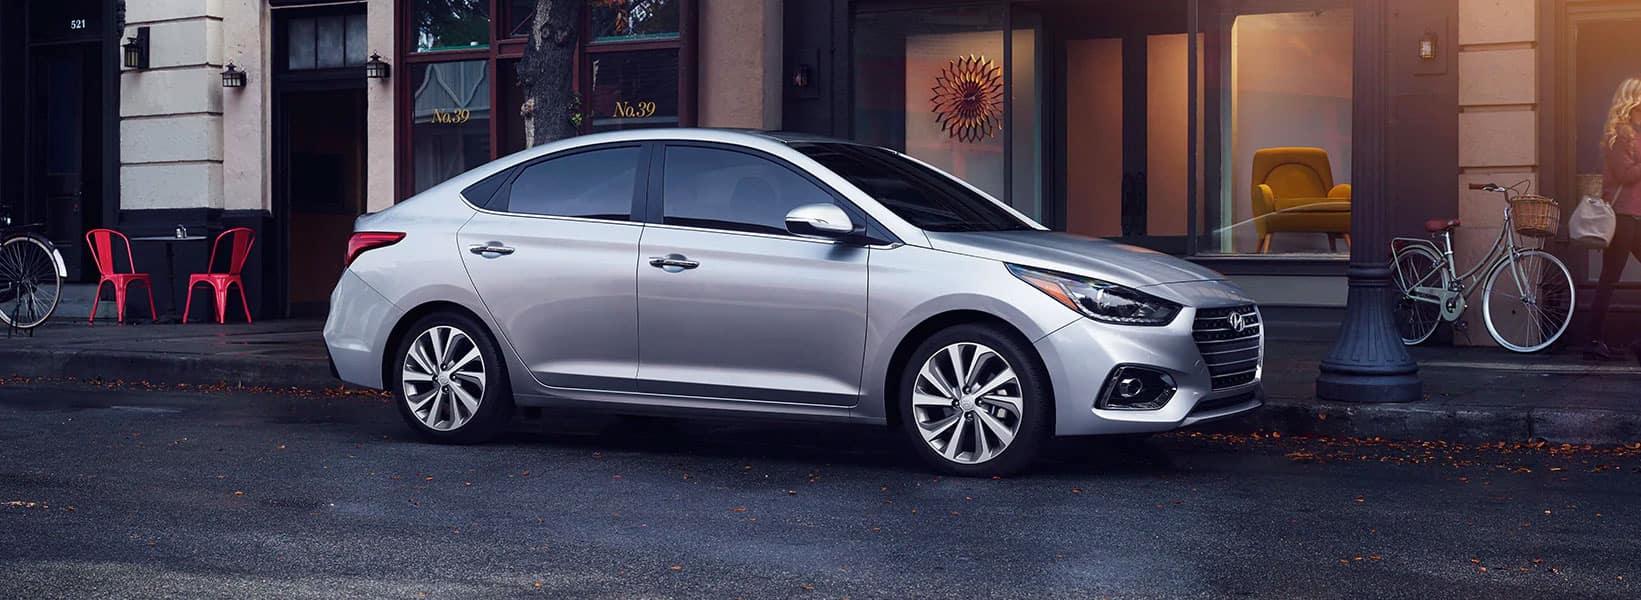 2019 Hyundai Accent Reviews Chicago IL